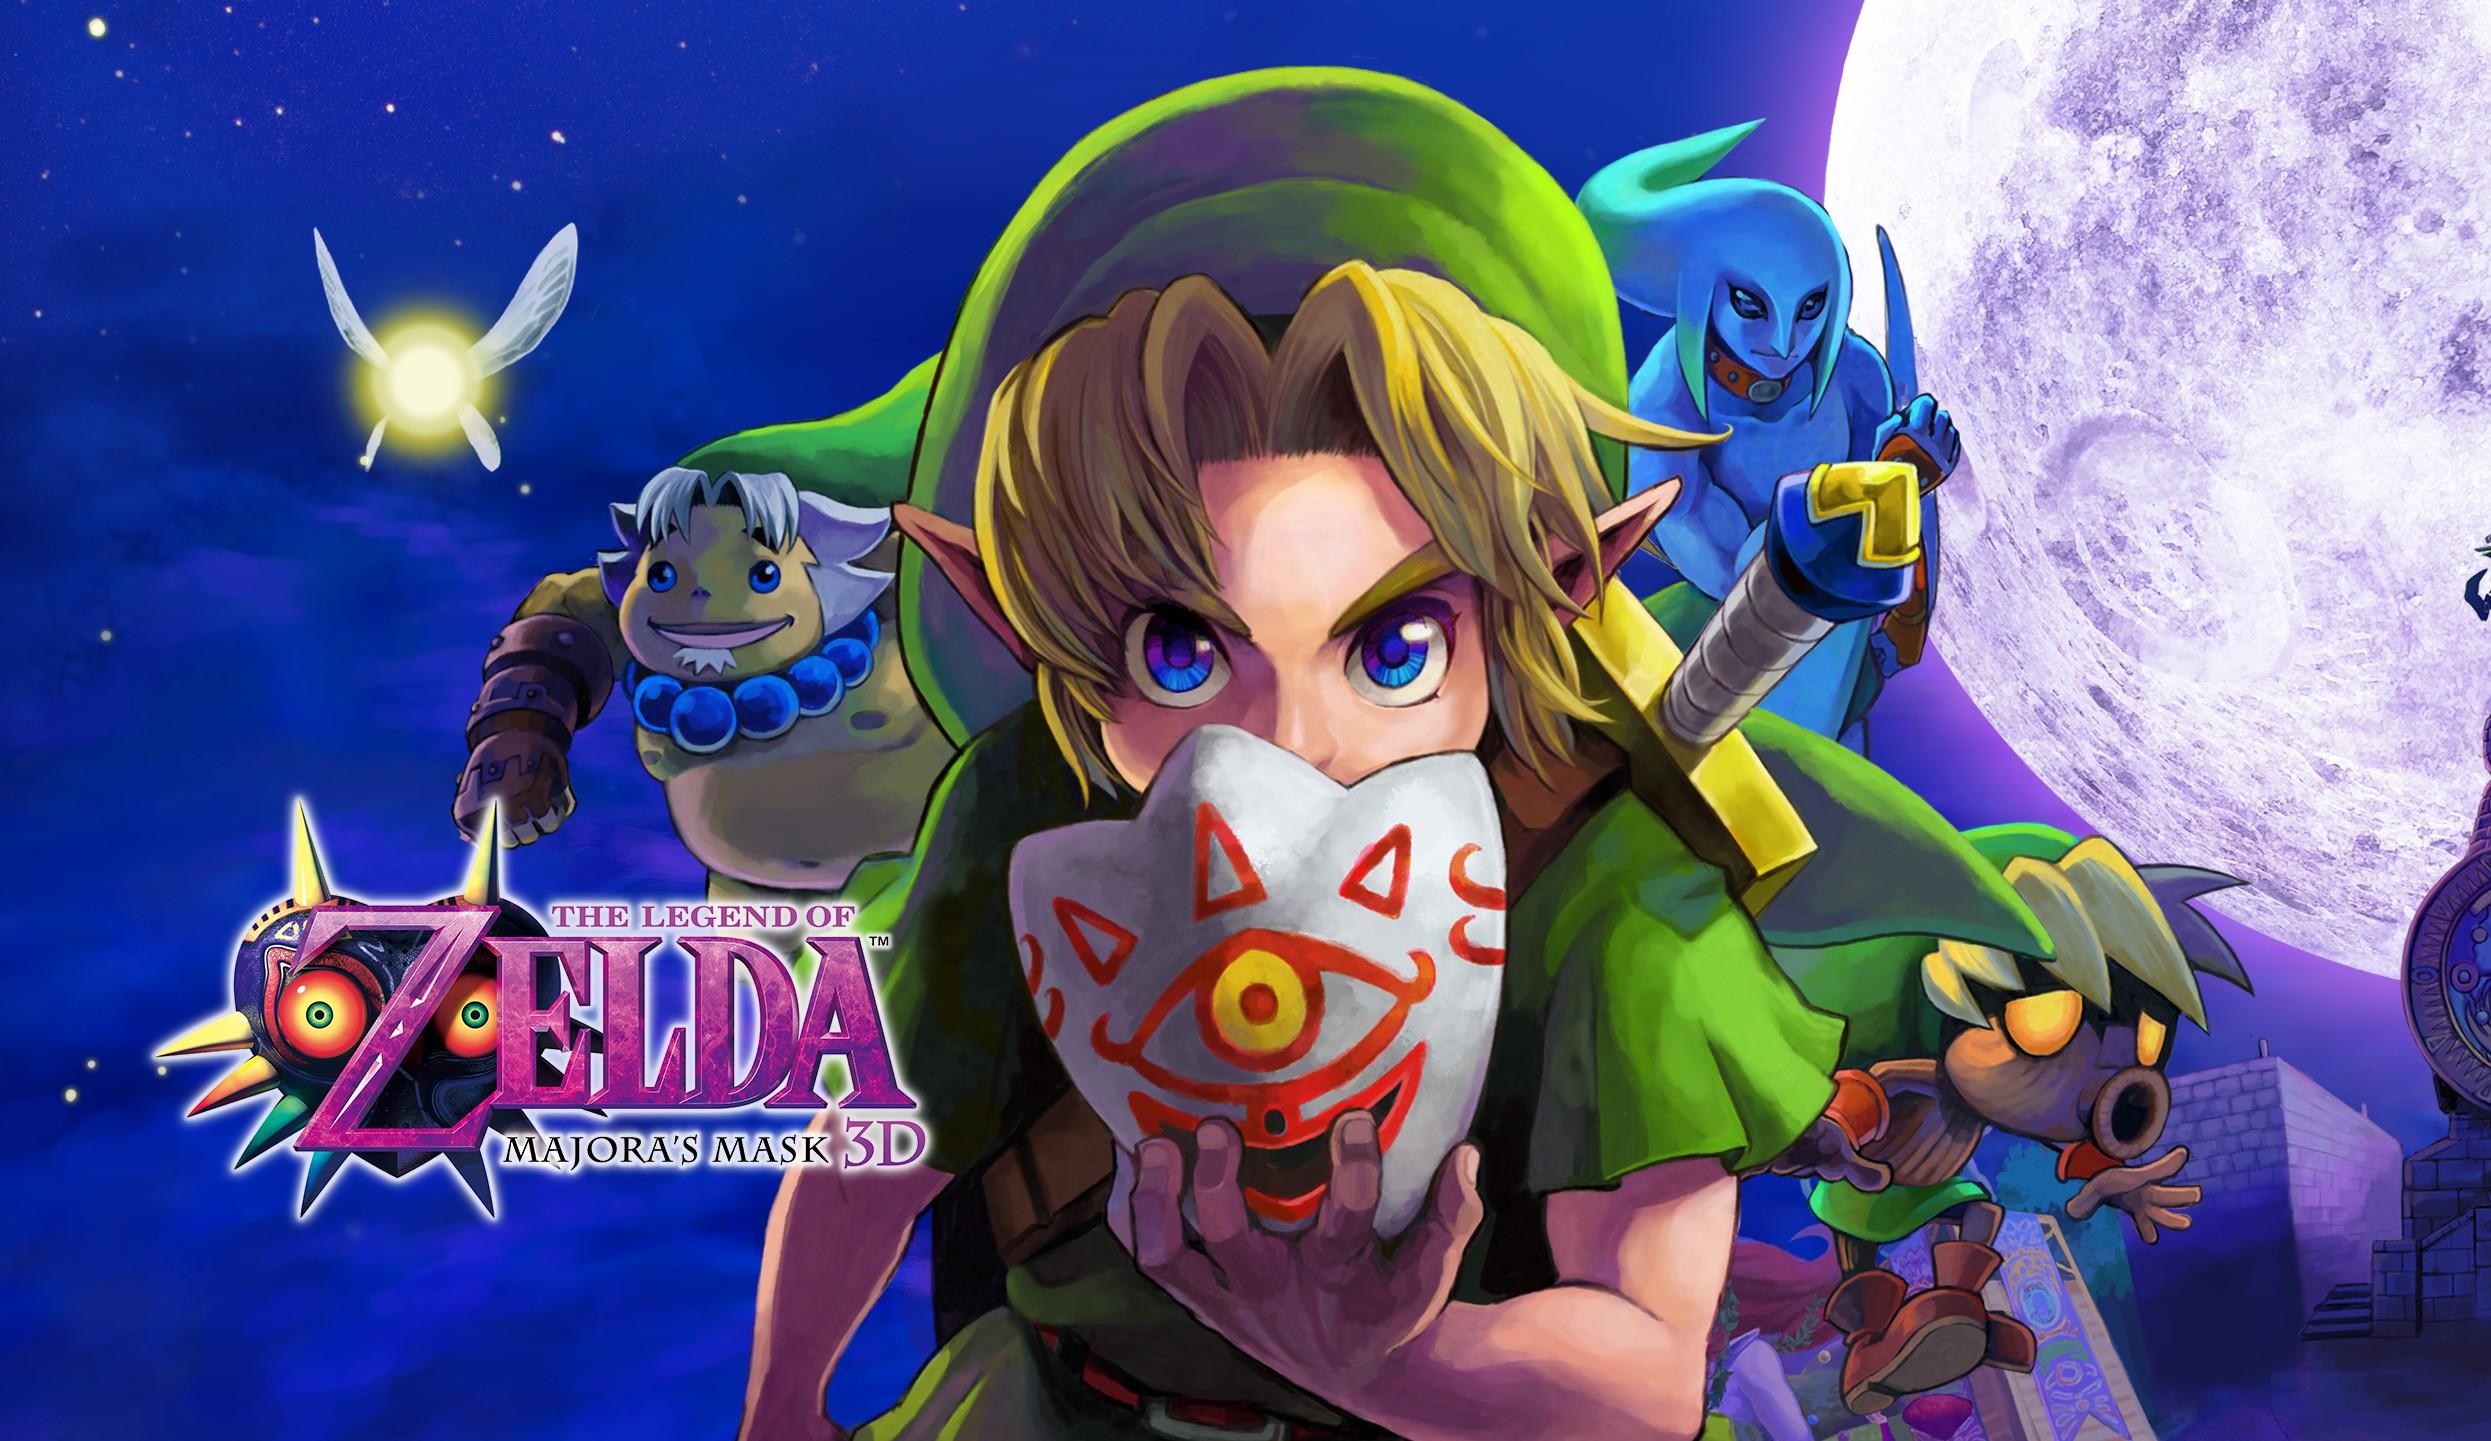 Zelda Forever Descargar Majoras Mask Arte E